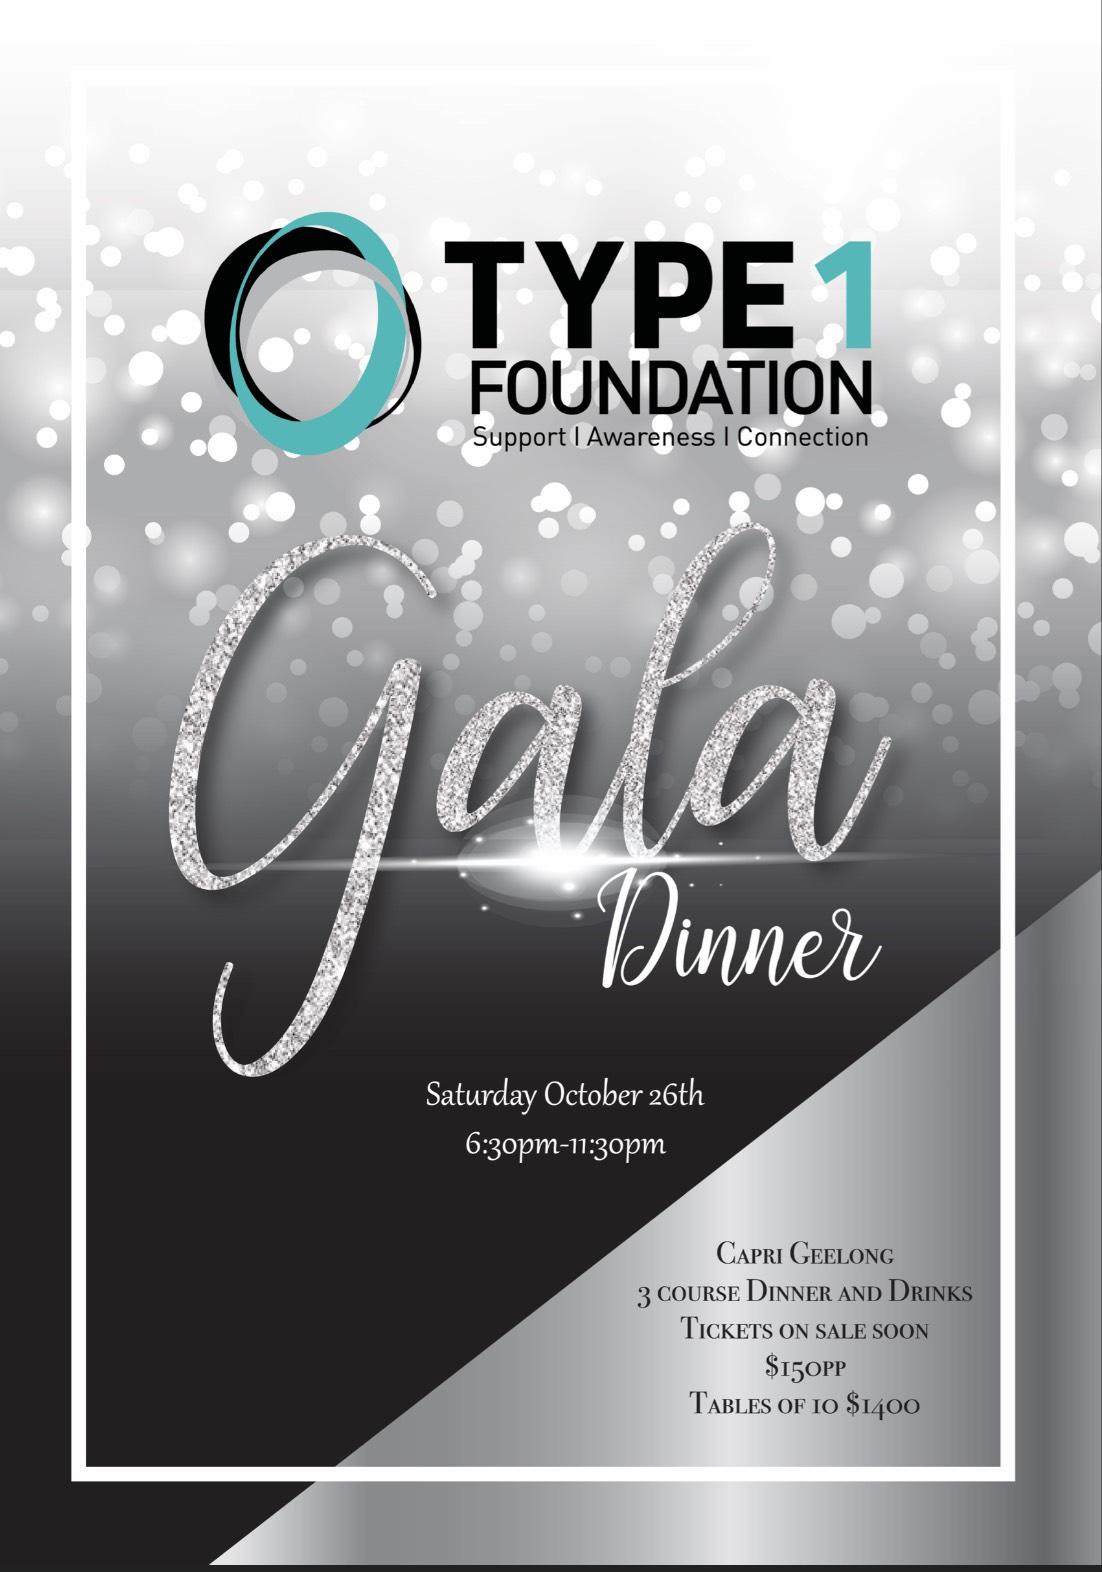 Gala-Dinner-Type-1-Foundation.jpeg